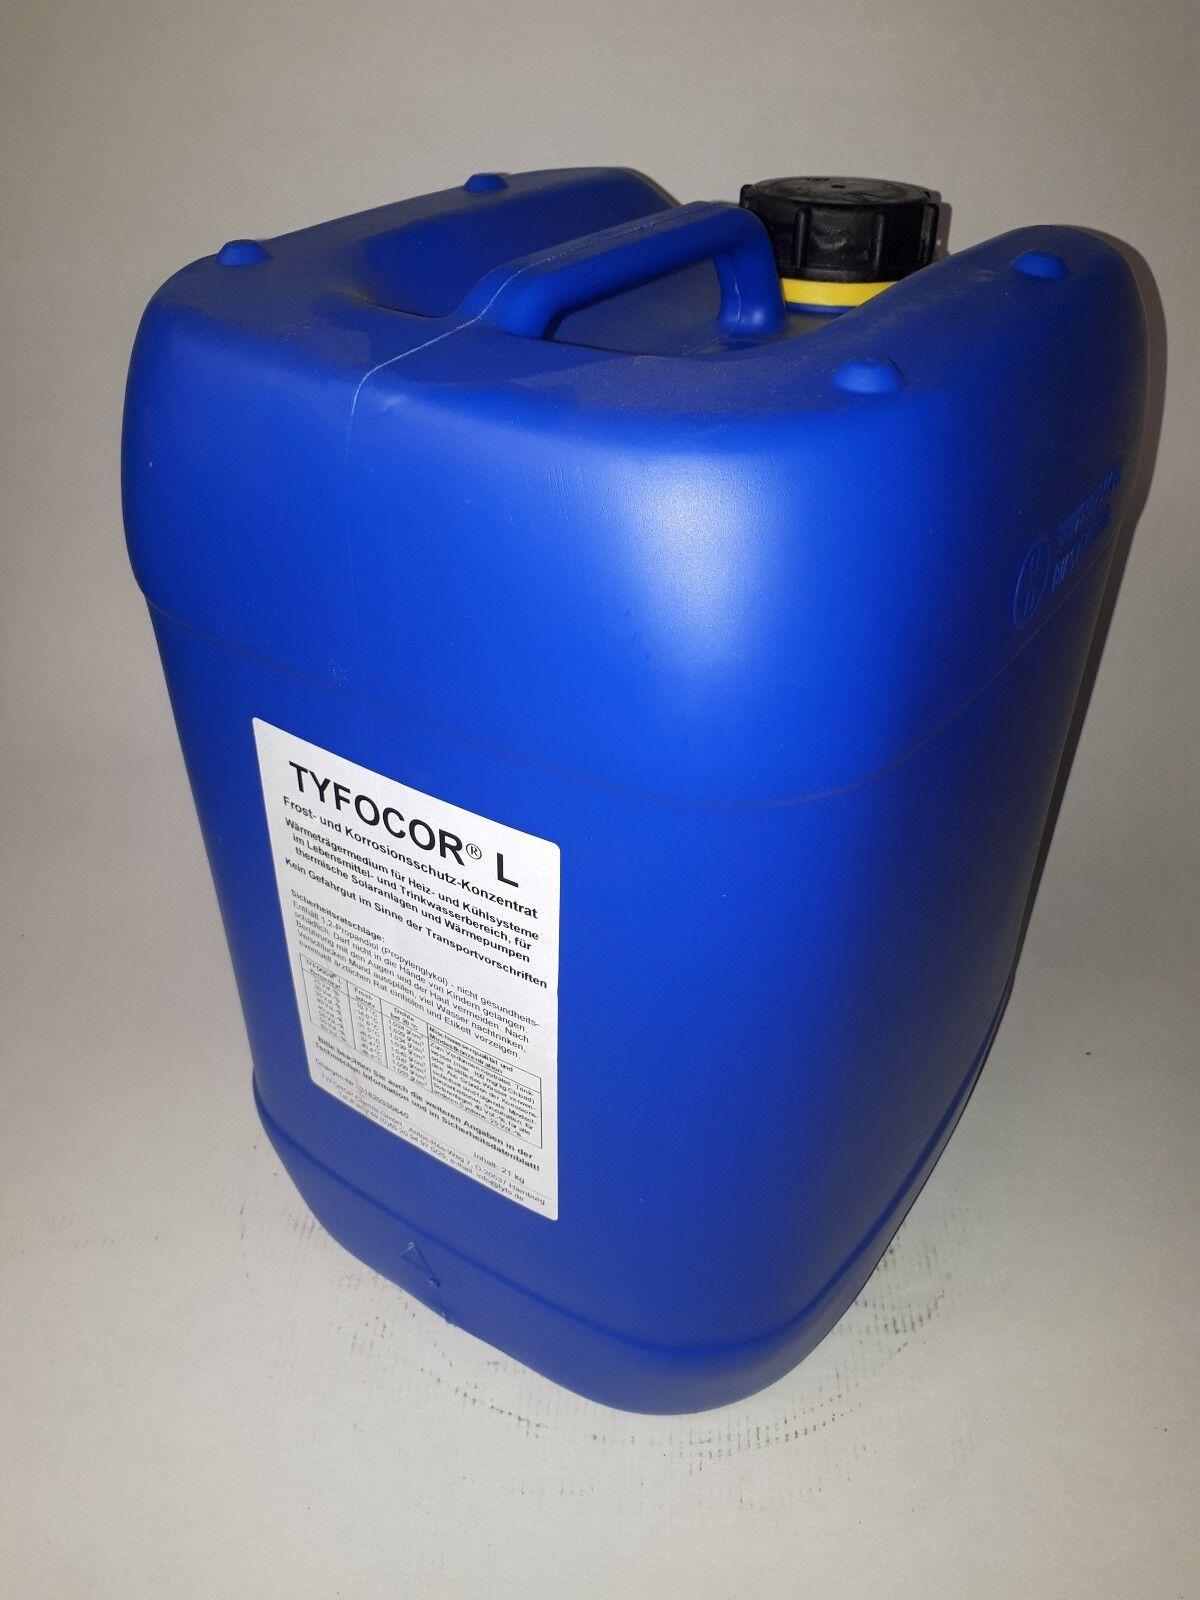 40 Liter (=2x20 L) Tyfocor L Konzentrat , Solarfluid Wärmeträgerflüssigkeit